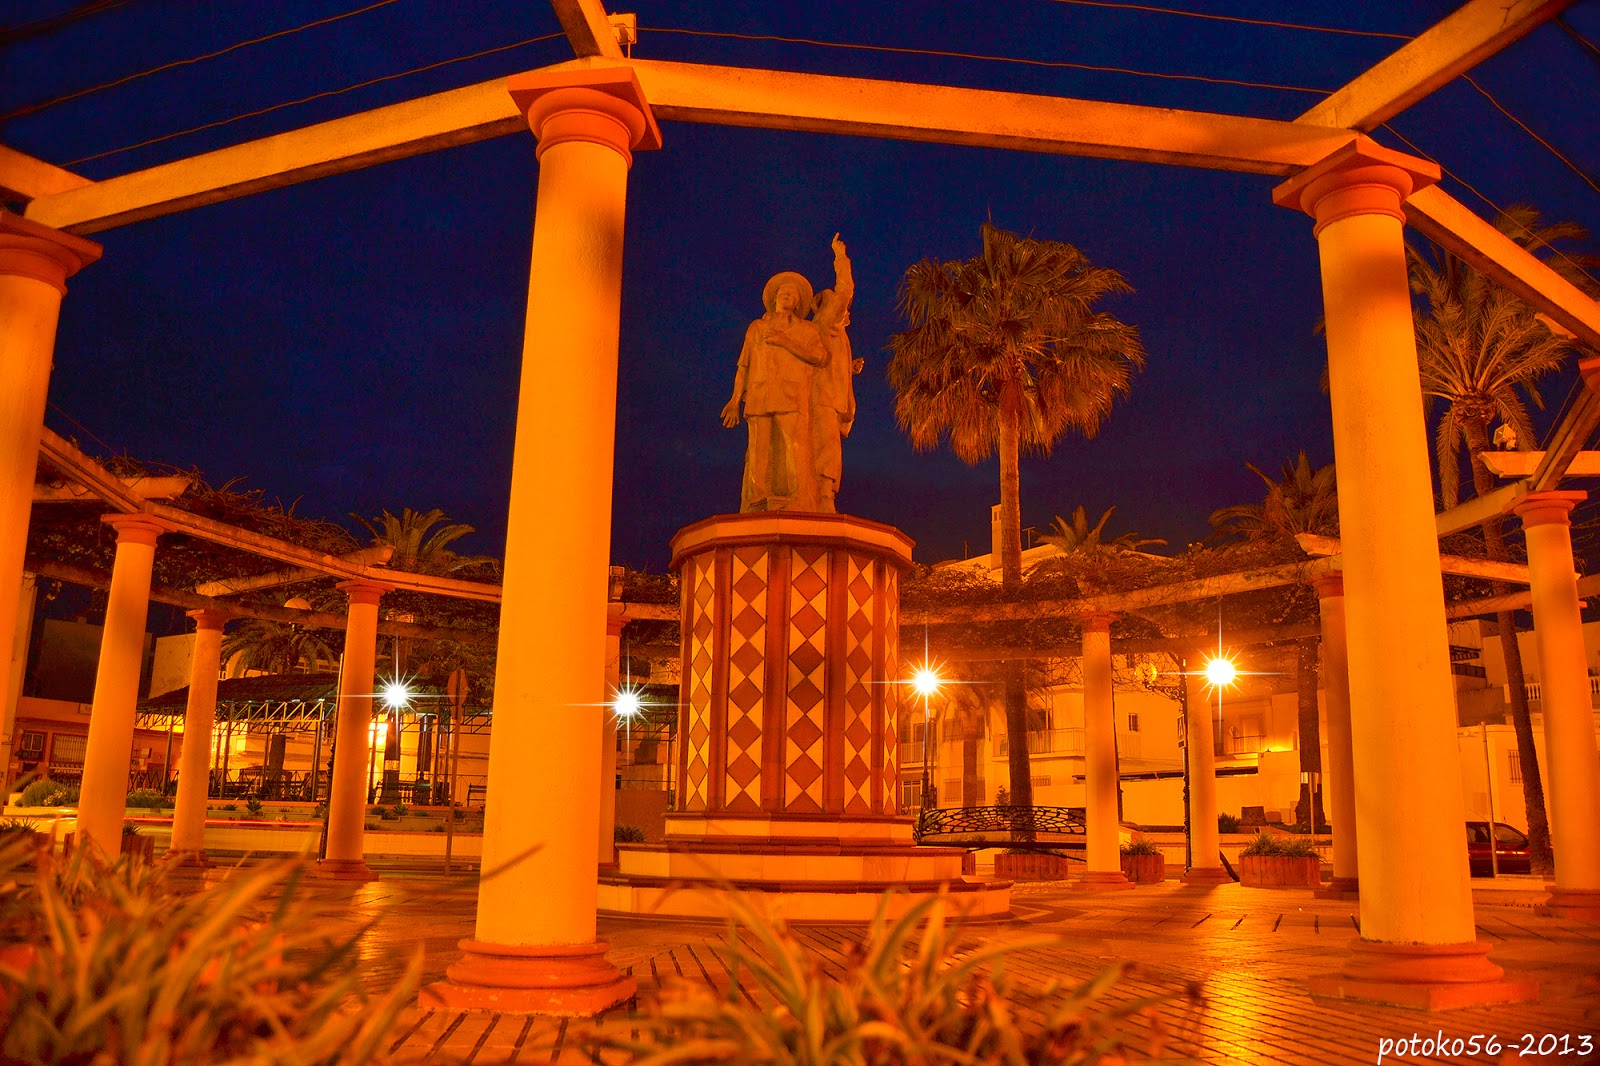 Monumento a Francisco Gutierrez (Guti) Rota